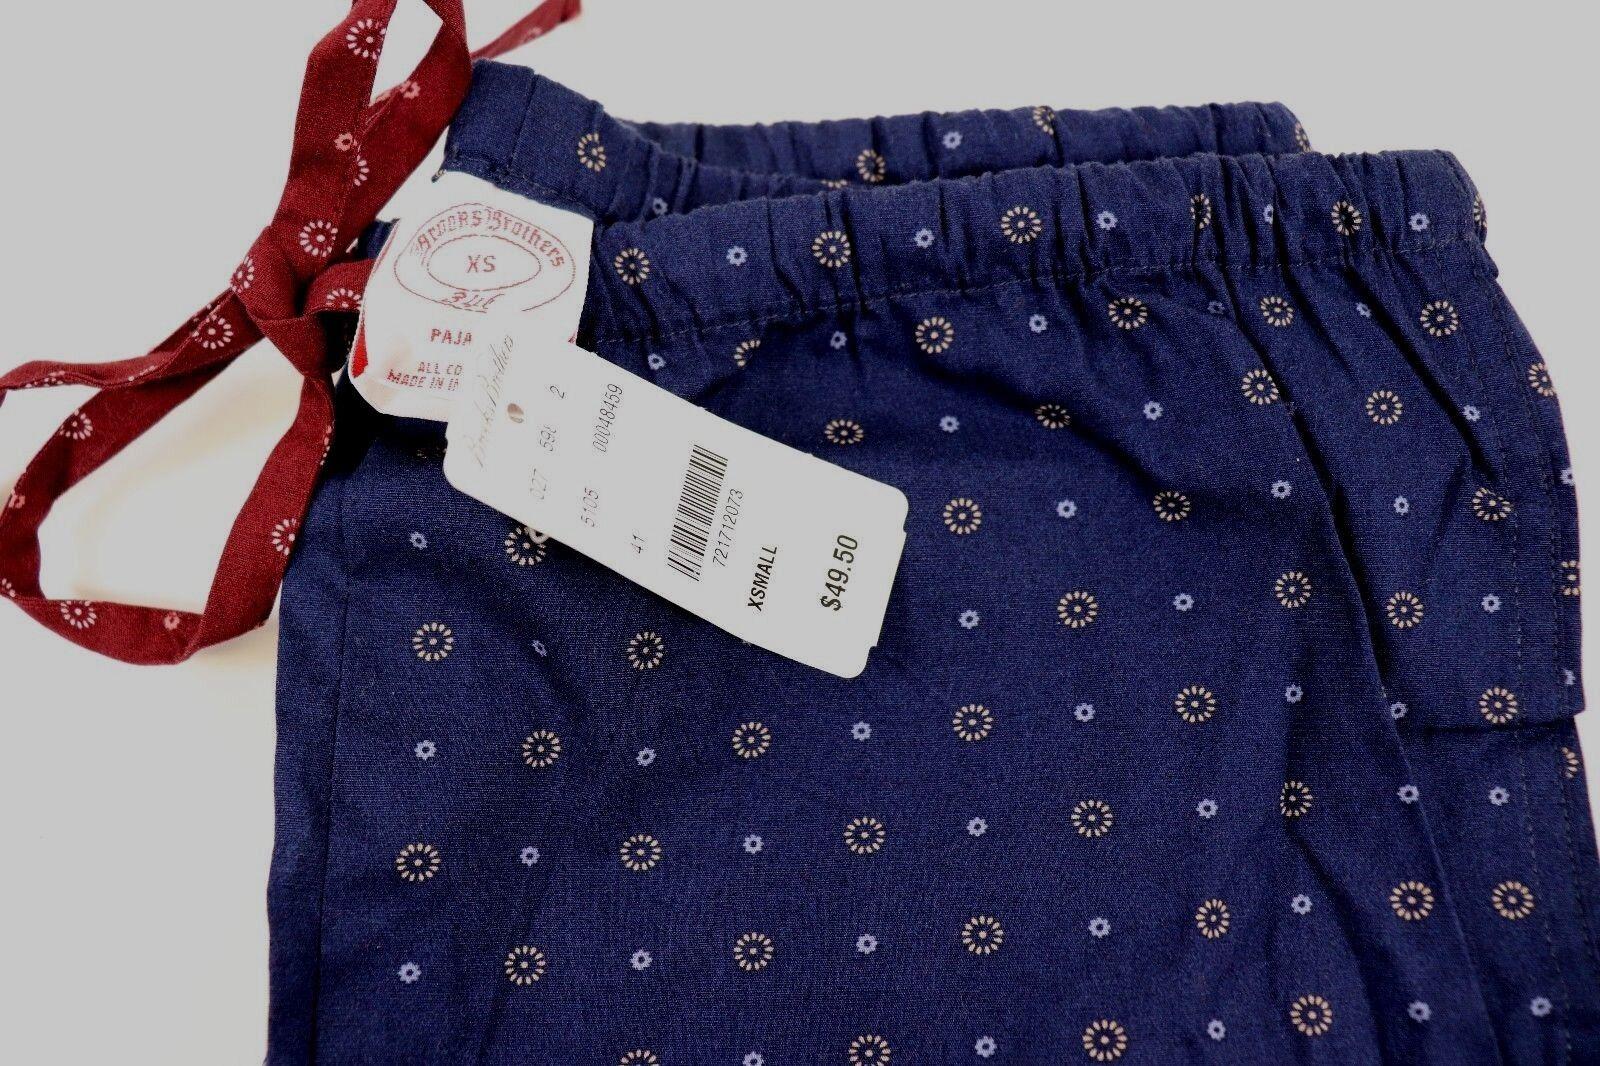 NWT BROOKS BredHERS Size XS Women's Navy Medallion Cotton Lounge Pants